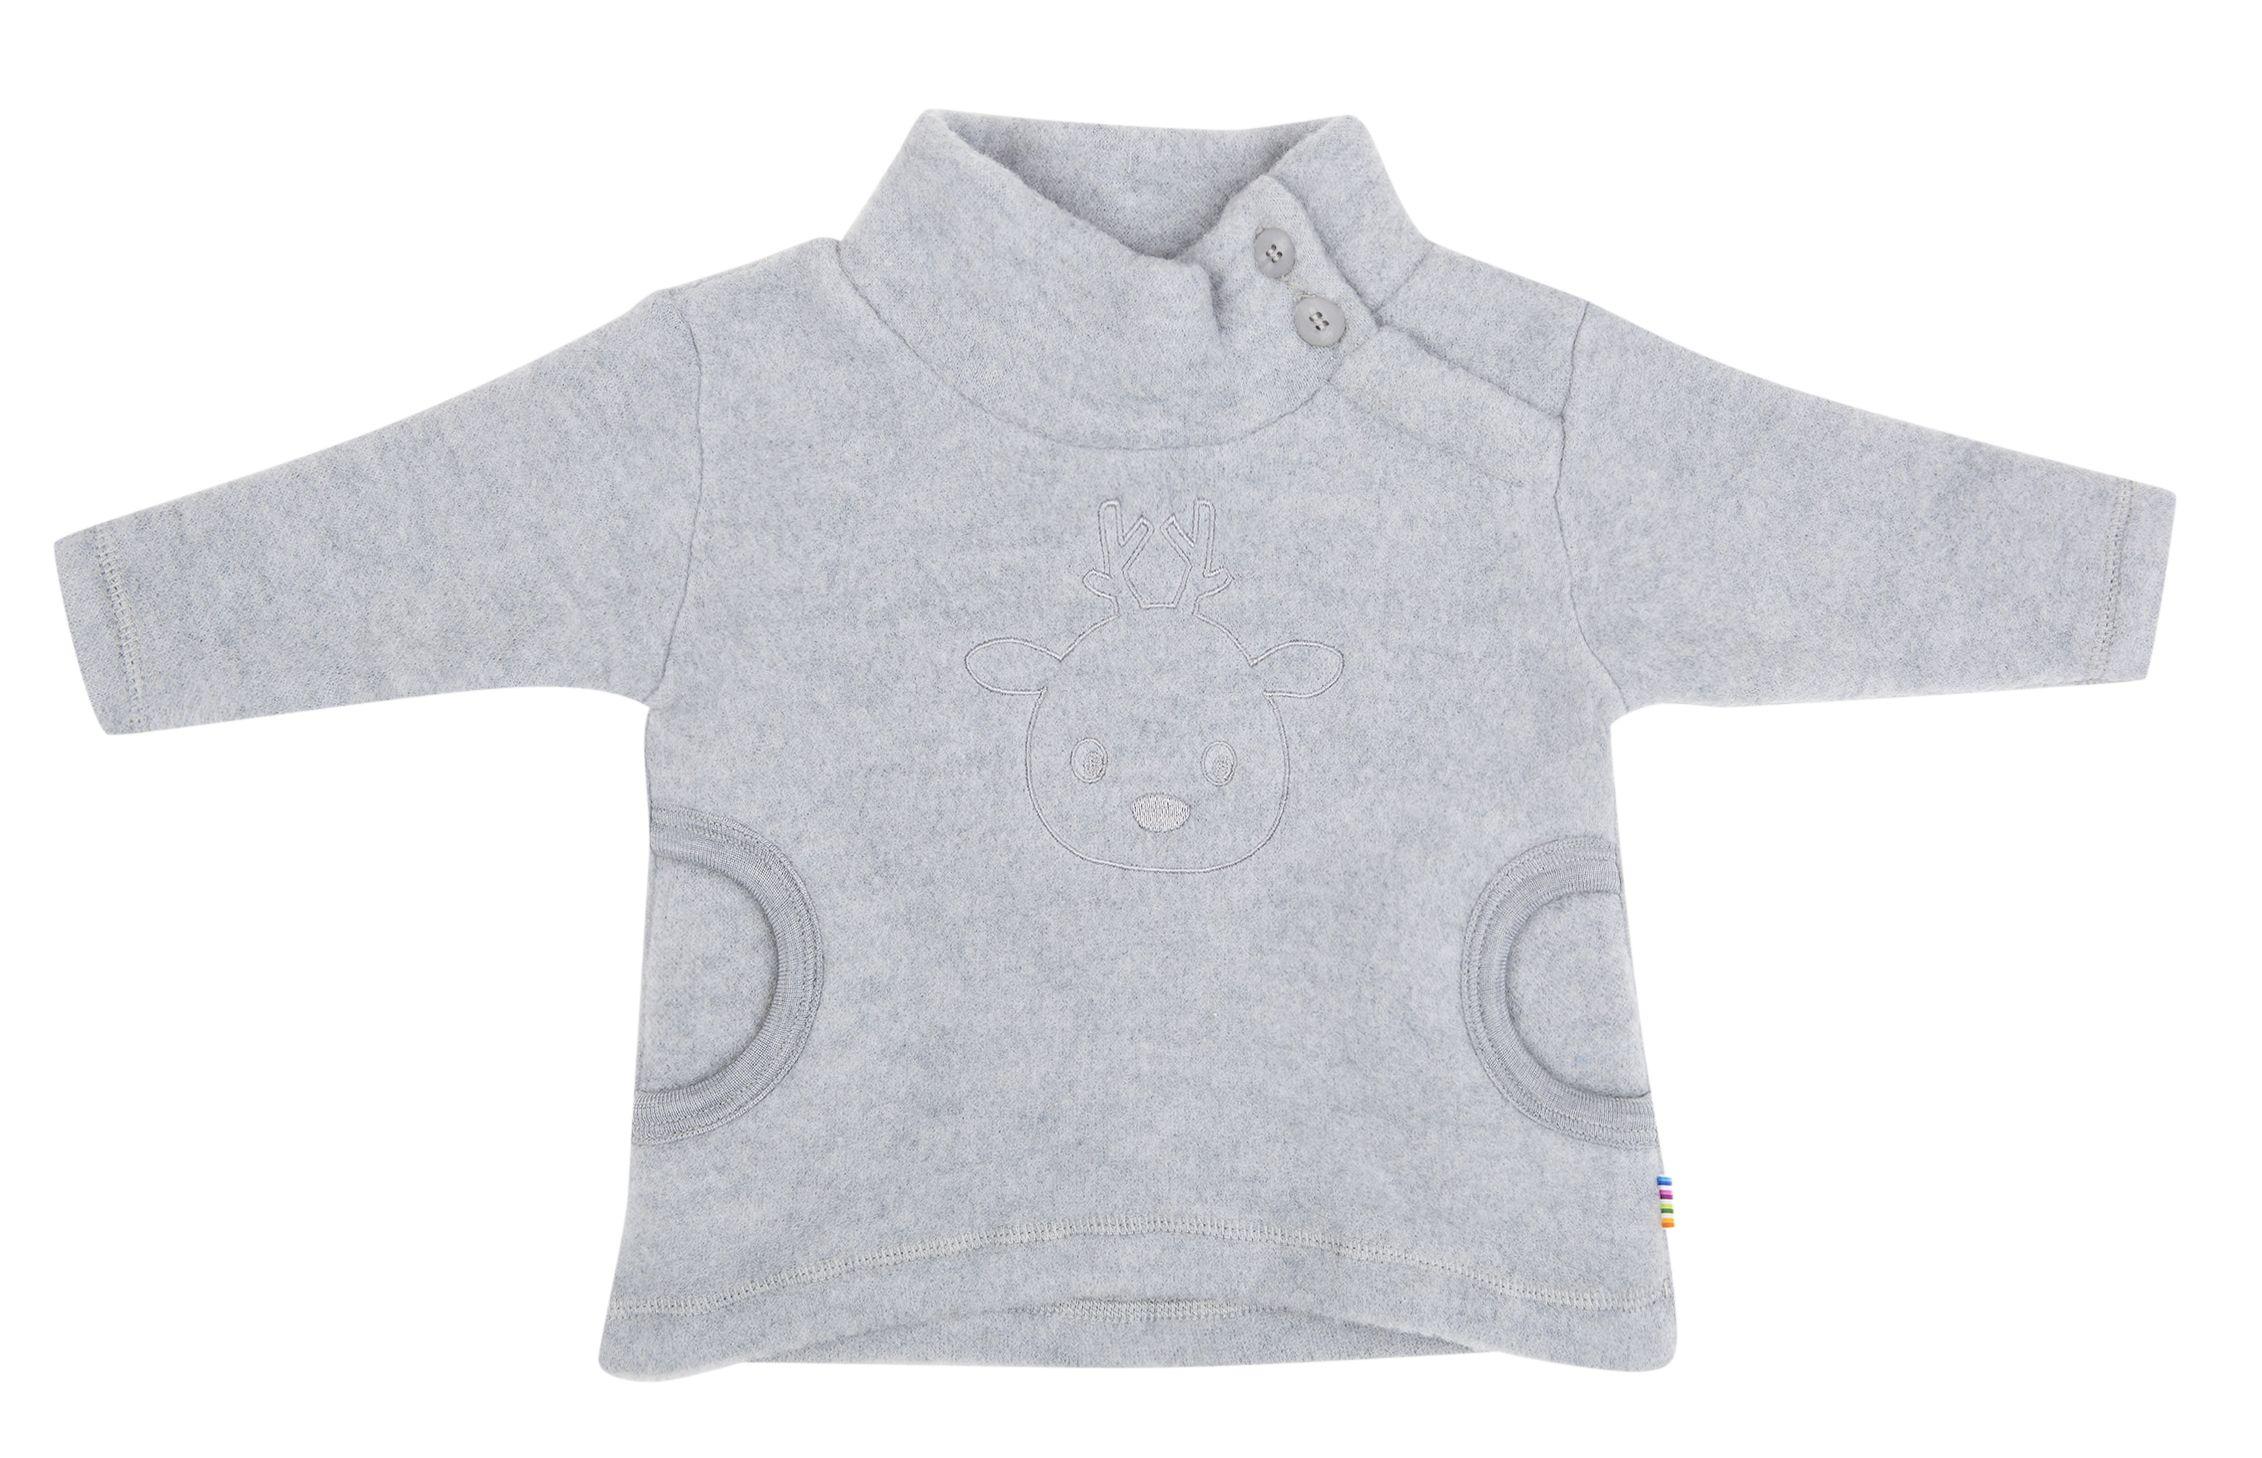 Anorak i Baby Uld (Soft Wool) fra Joha - Grey melange thumbnail